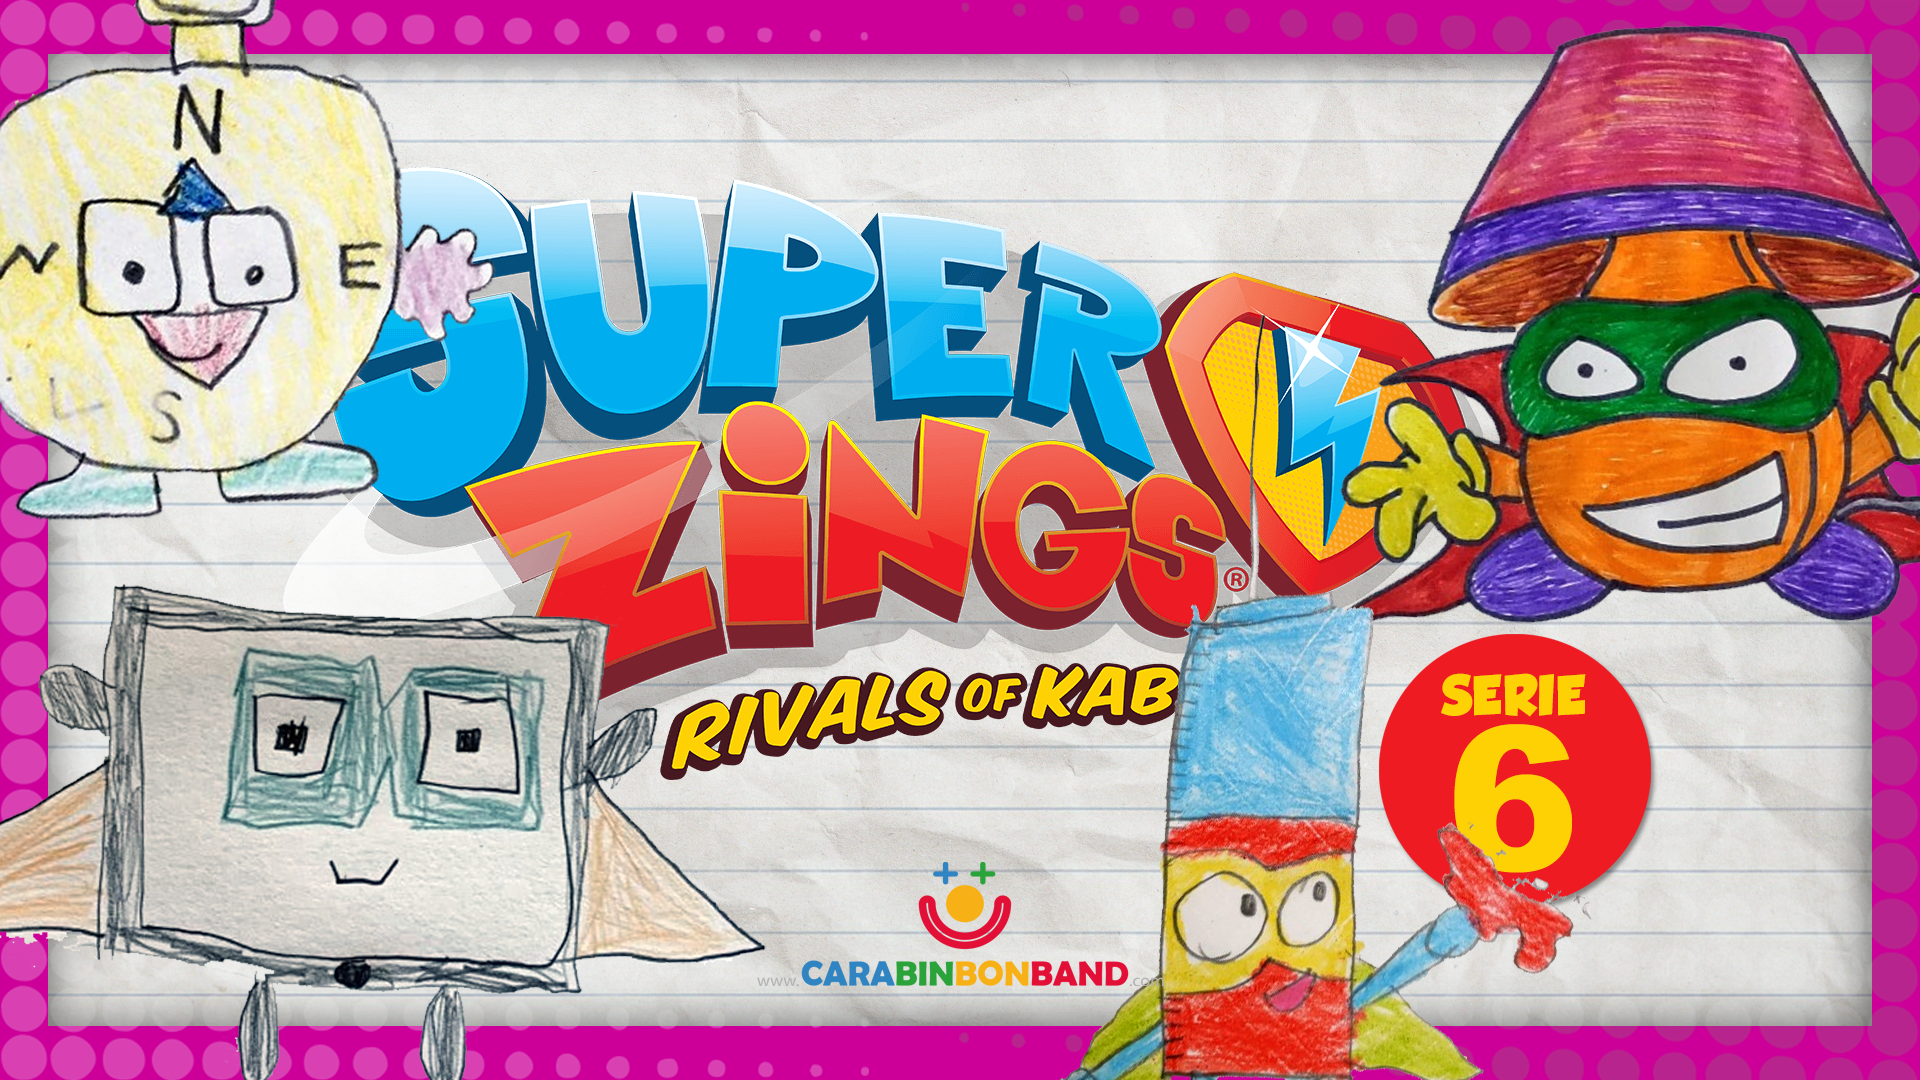 SUPERZINGS SERIE 6 inventada por los niños PARTE 2 - imaginando Superzings